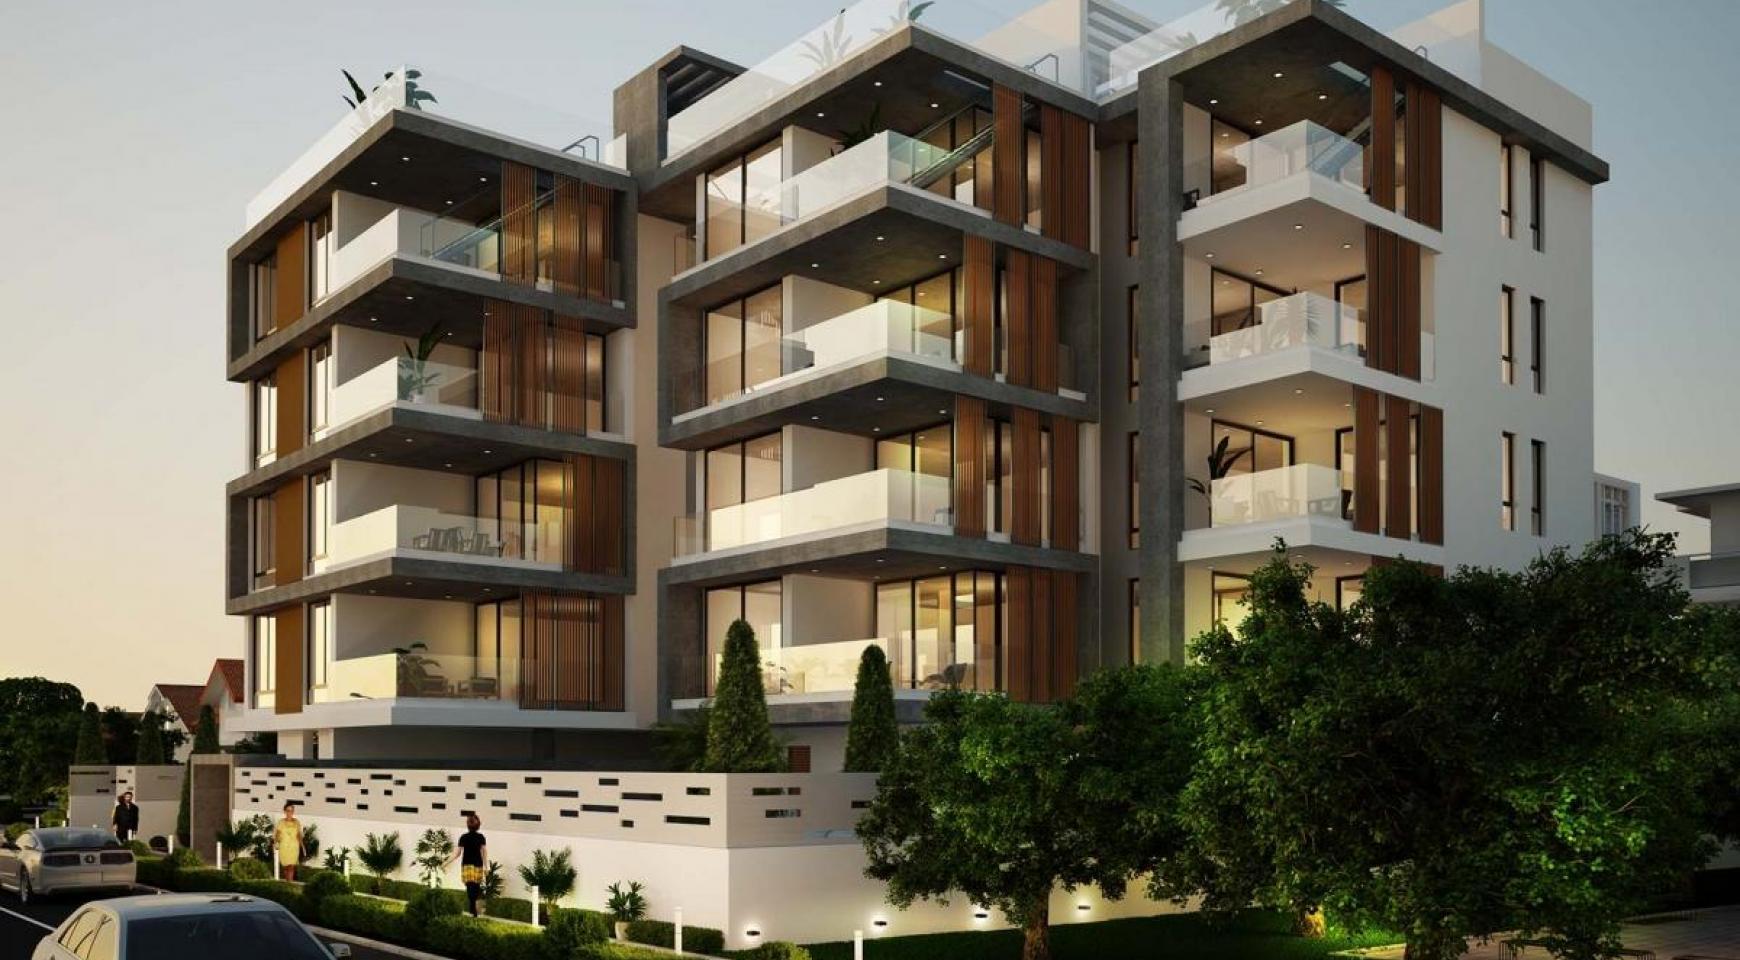 Contemporary 3 Bedroom Apartment in a New Complex near the Sea - 10